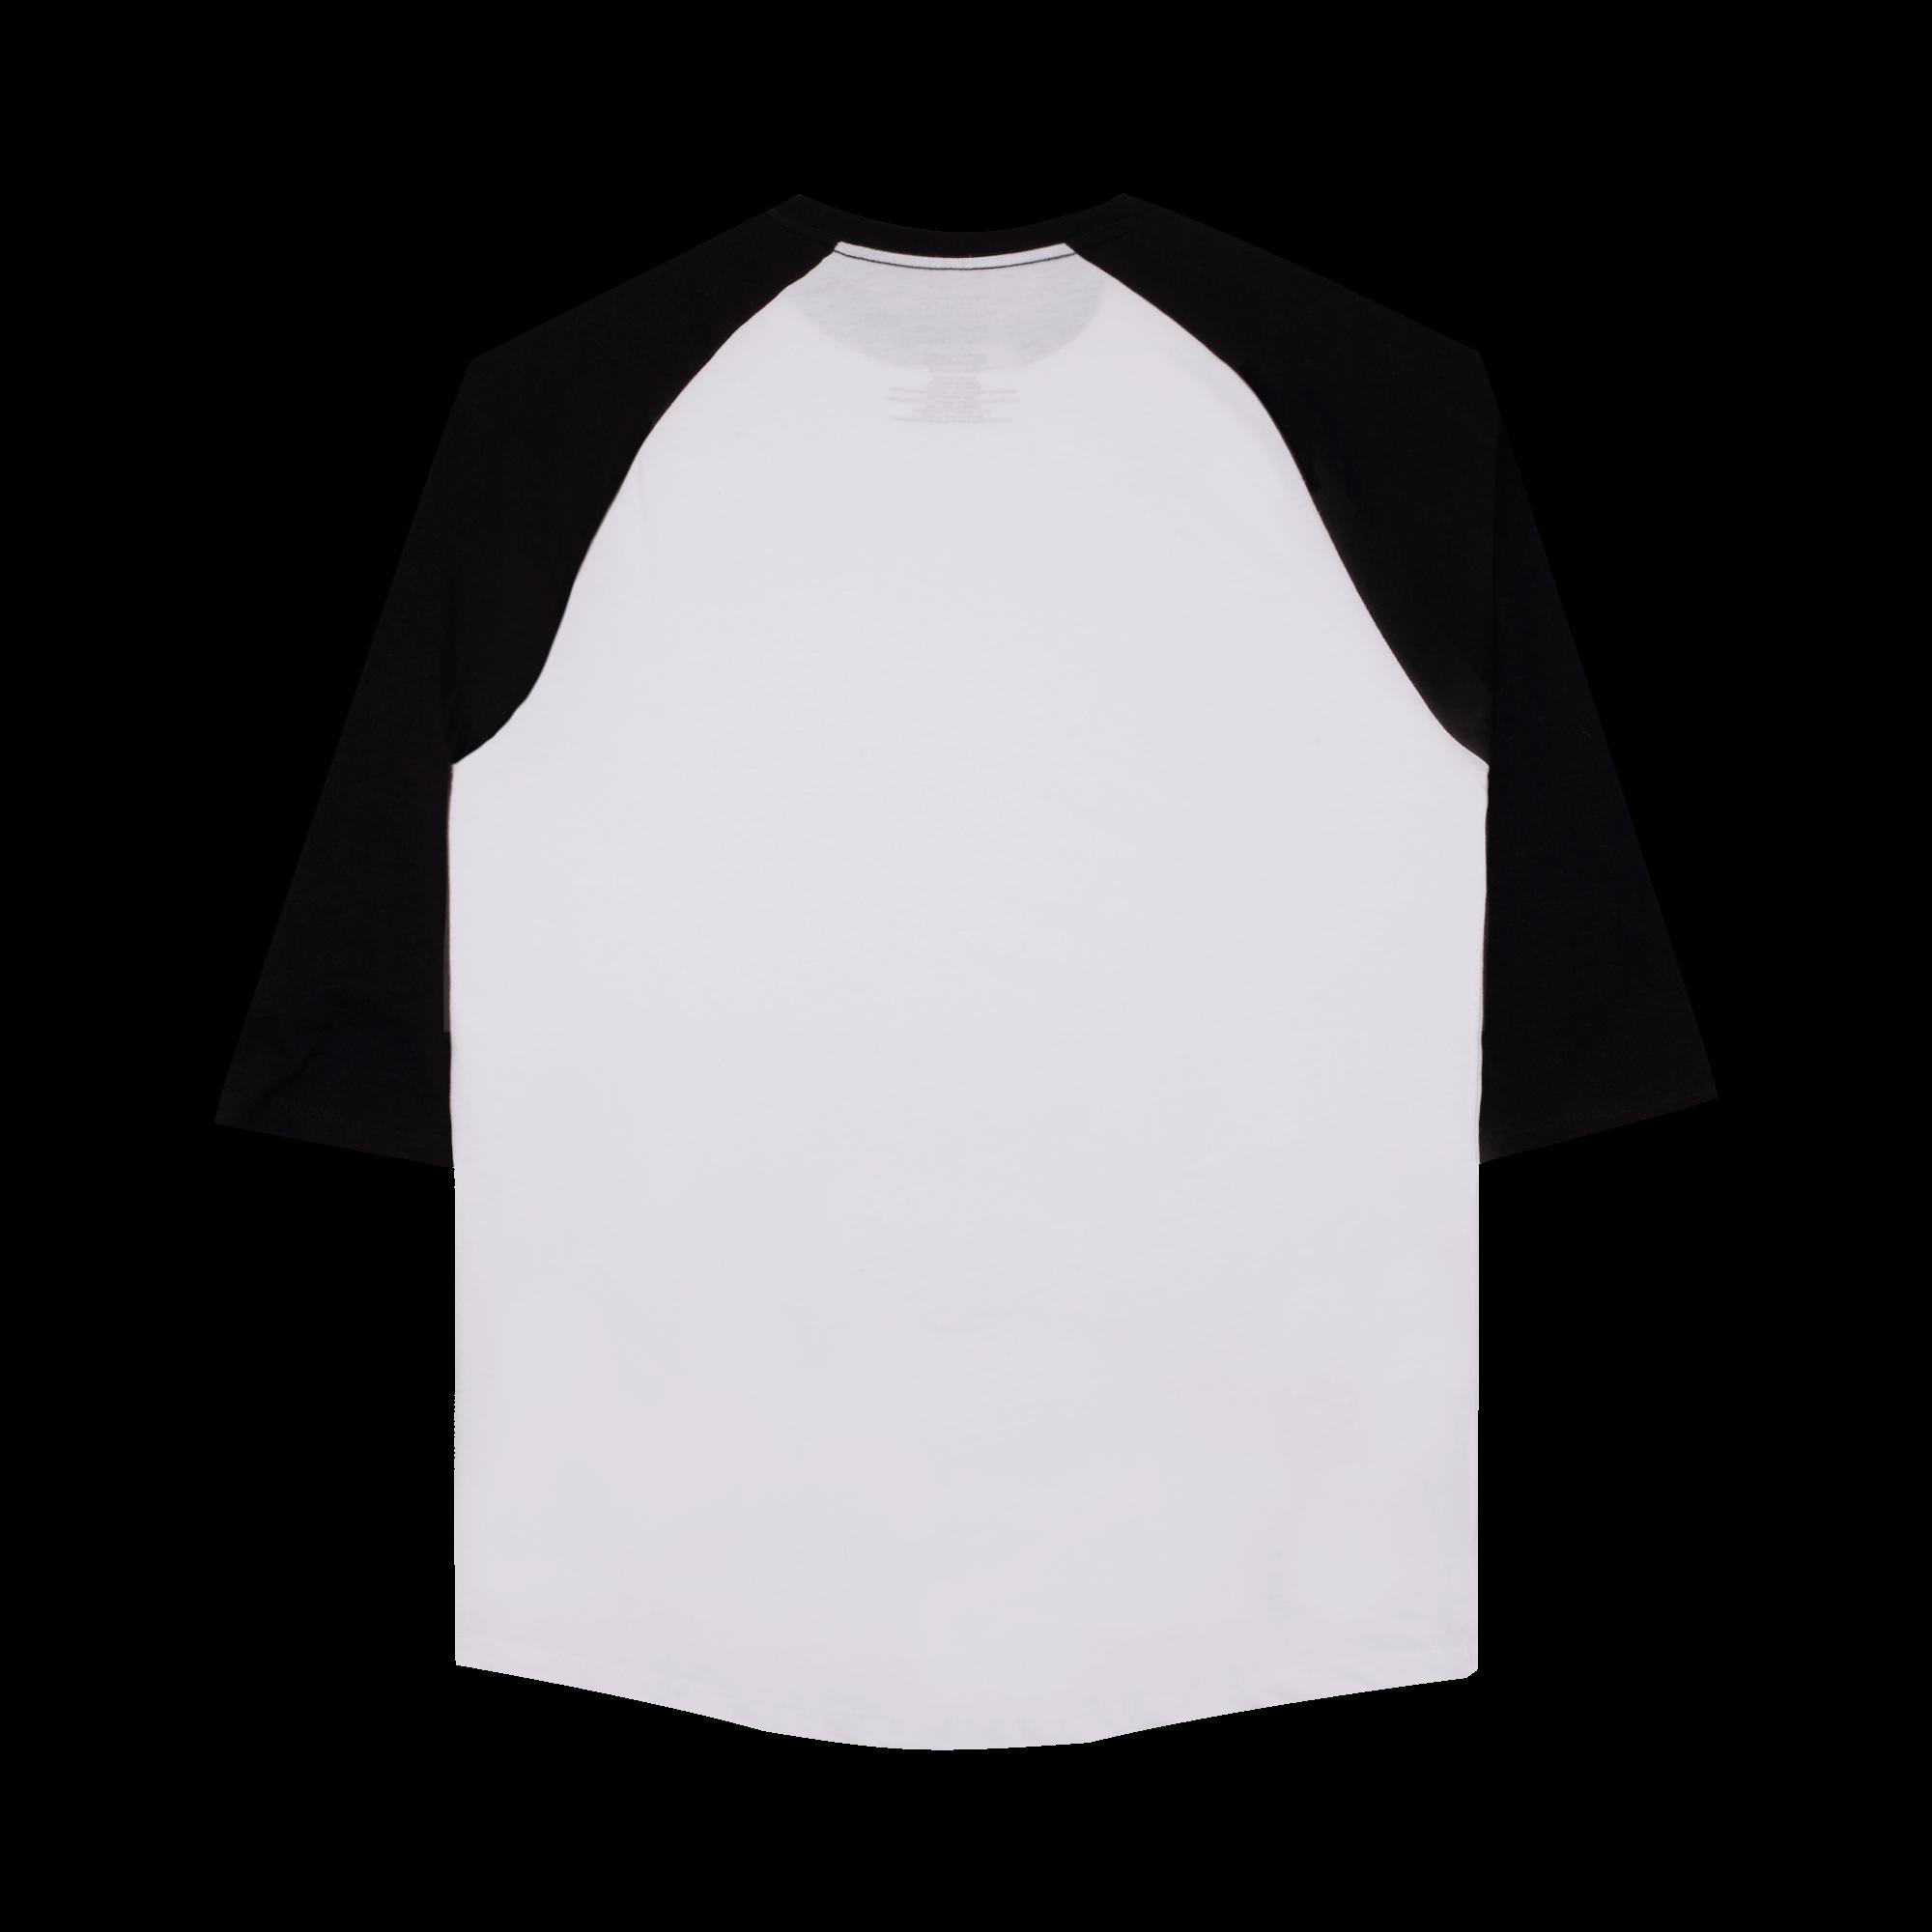 Tee x Marvel white / black